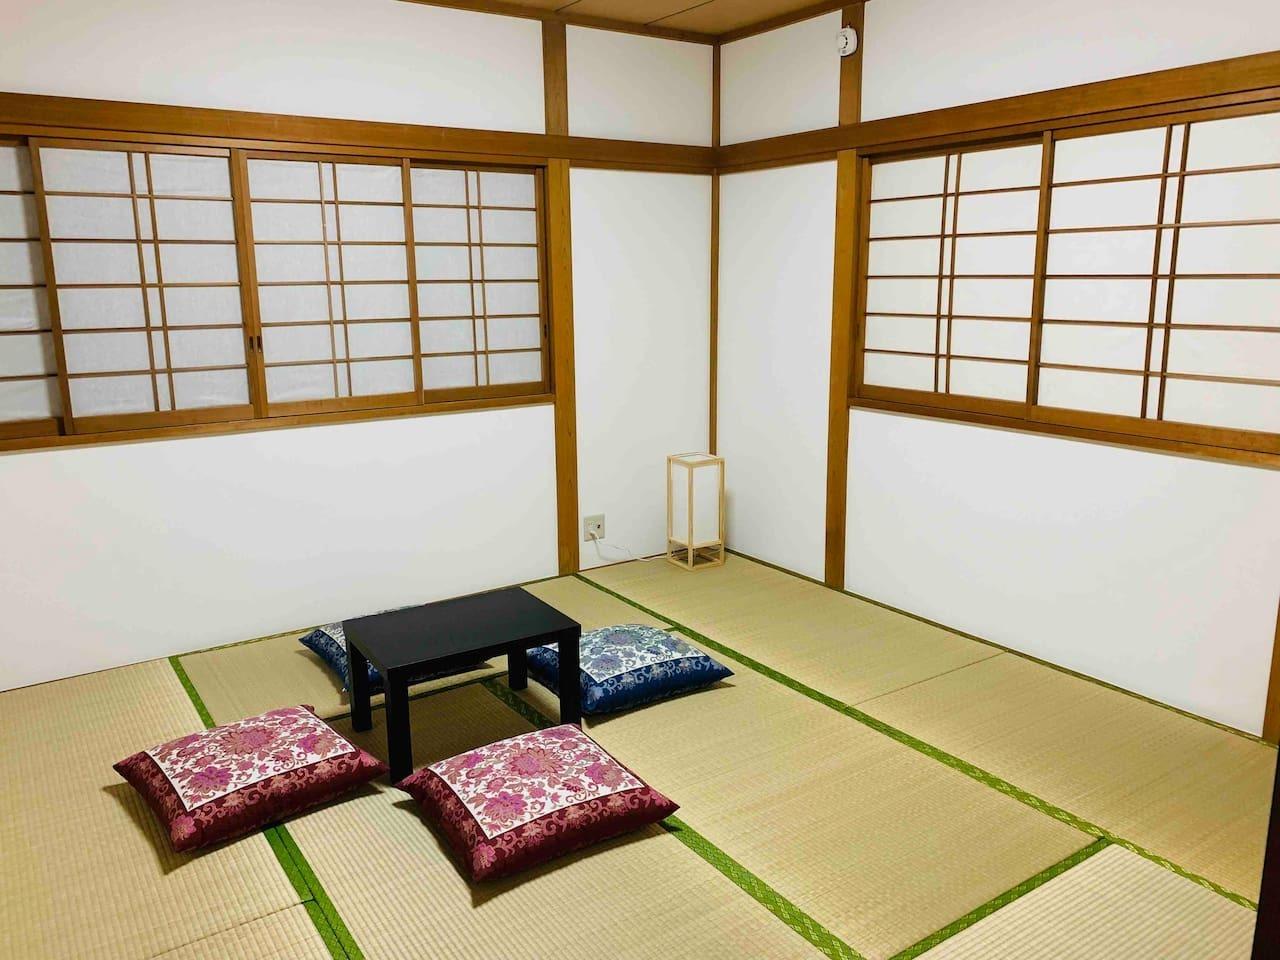 【Japan-style room #203 / 2楼203日式榻榻米 / 2階203和室】